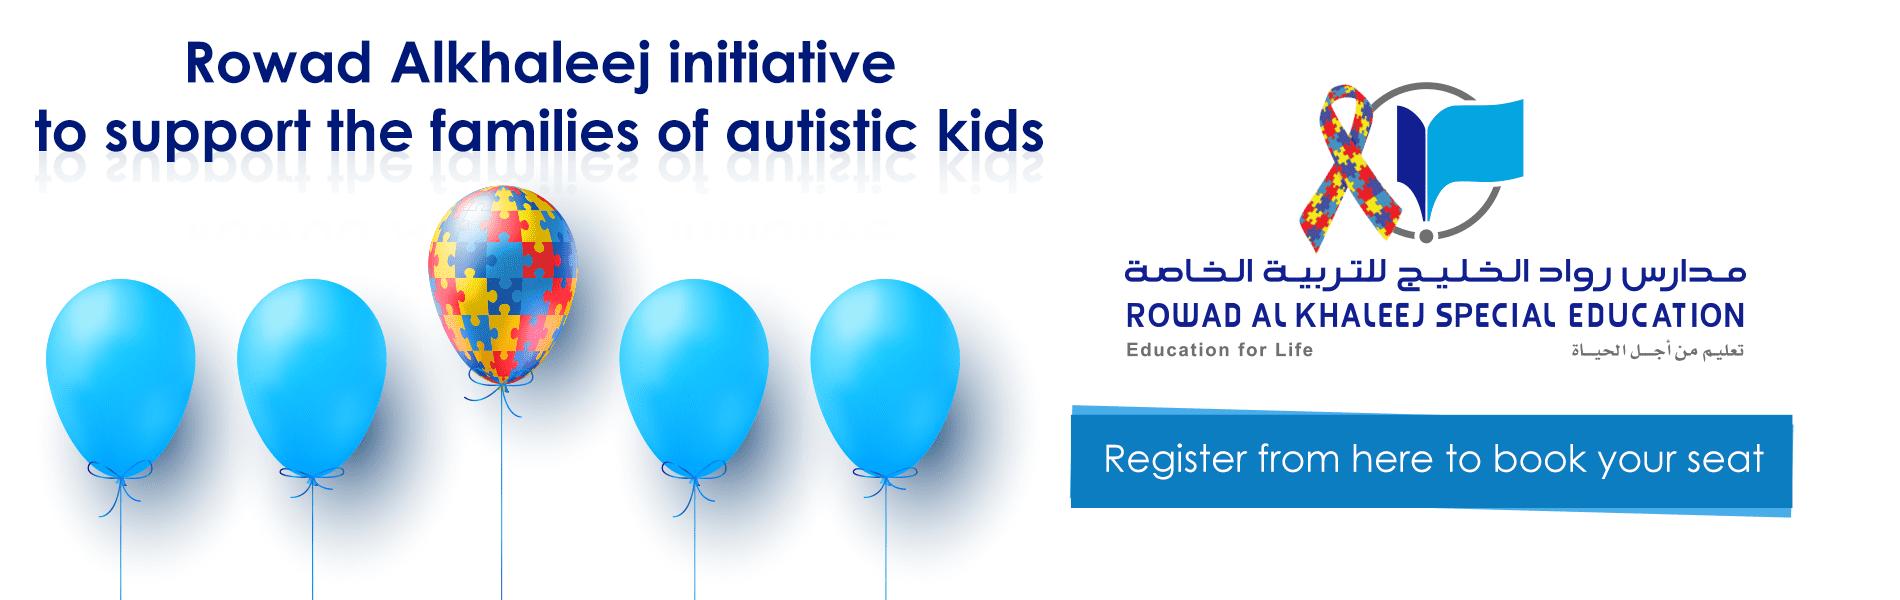 Autism and ADHD Awareness - استشارات التربية الخاصة للأسر